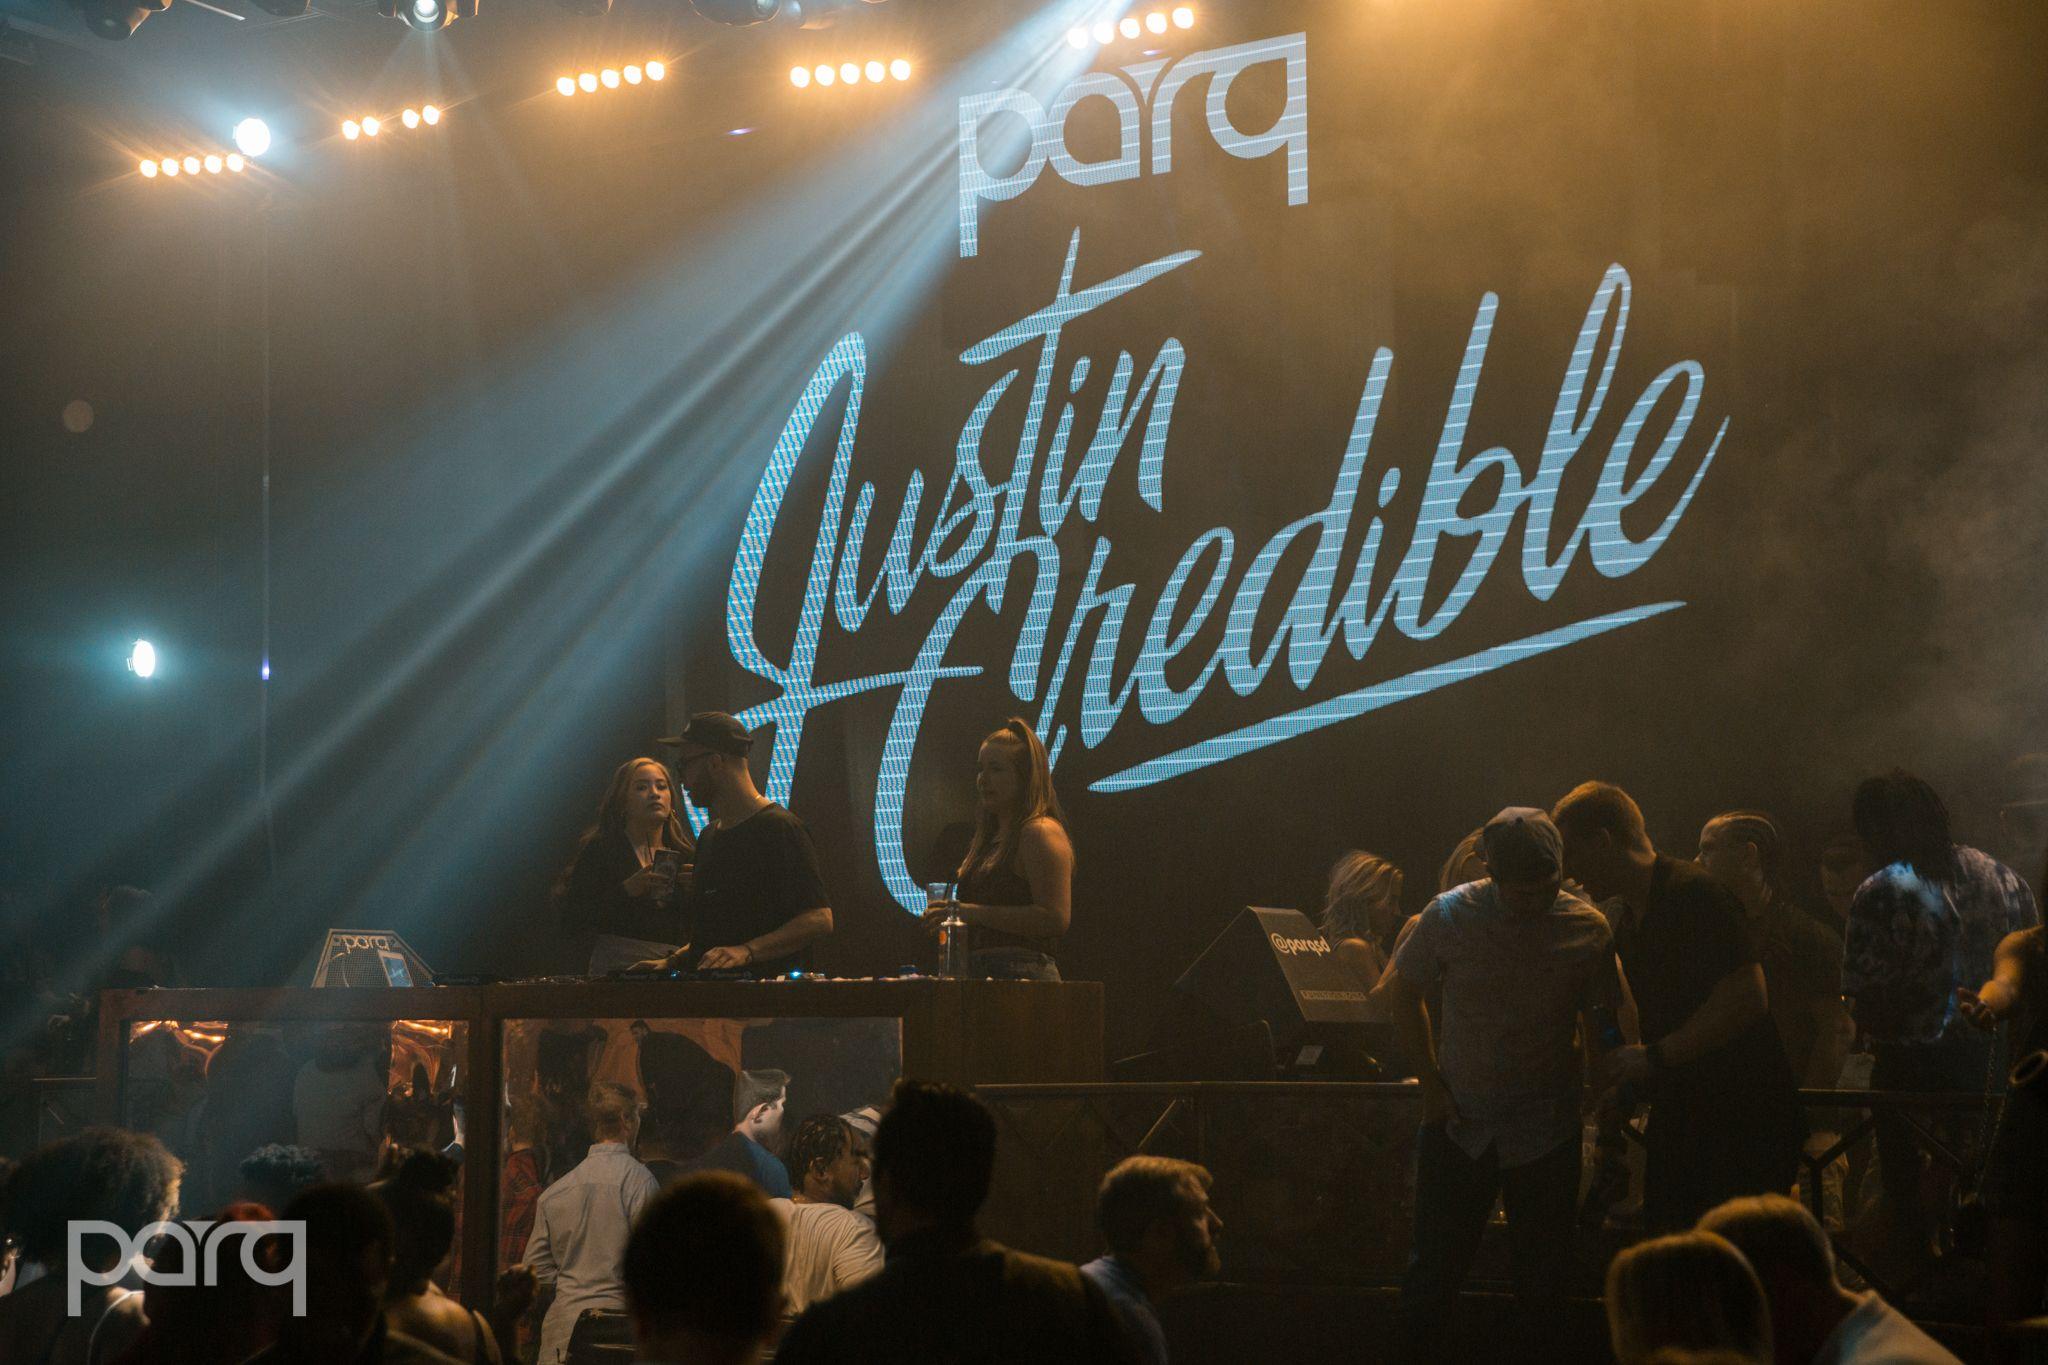 09.15.18 Parq - Justin Credible-14.jpg